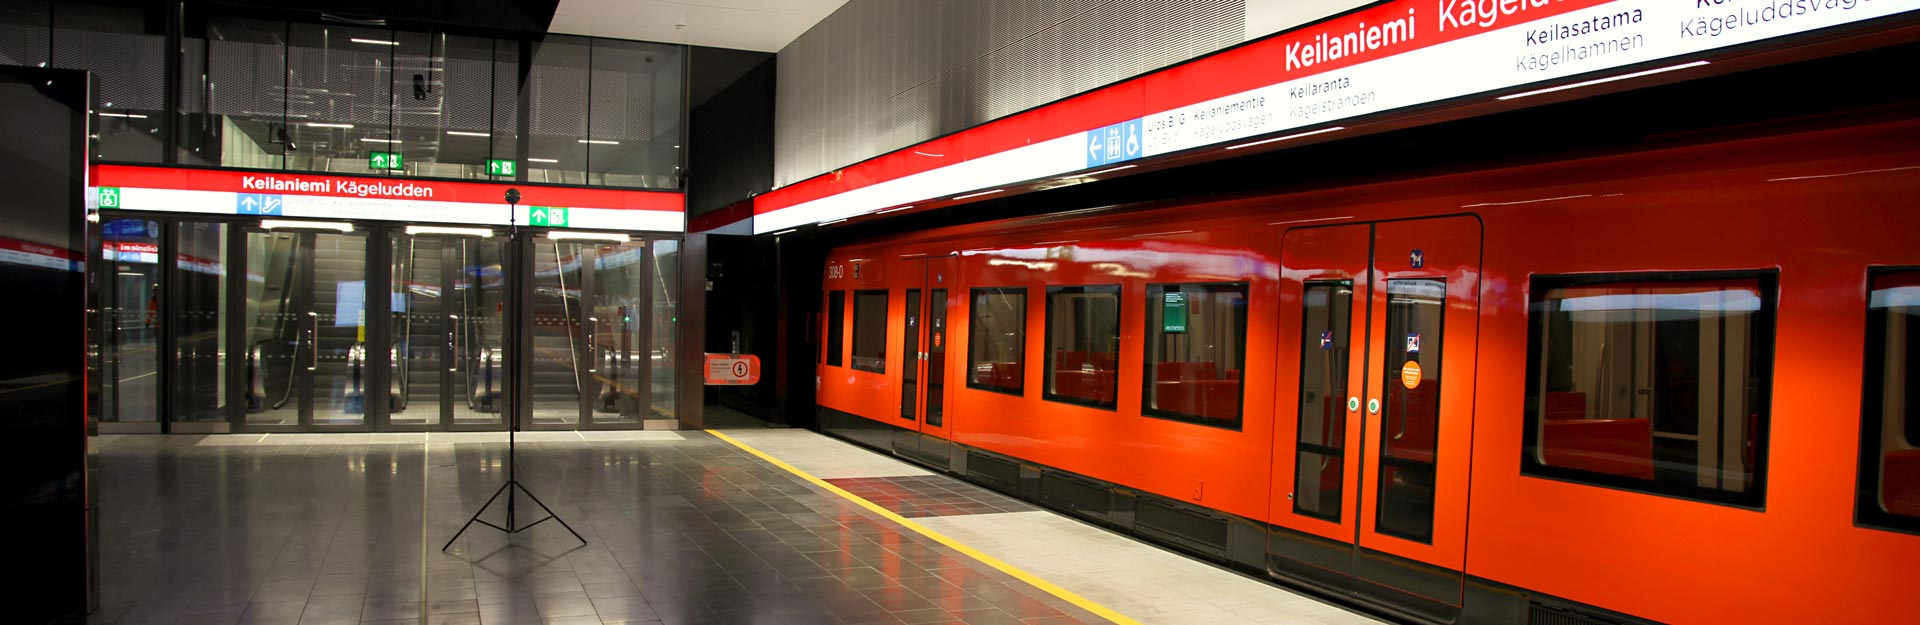 Keilaniemen metroasema